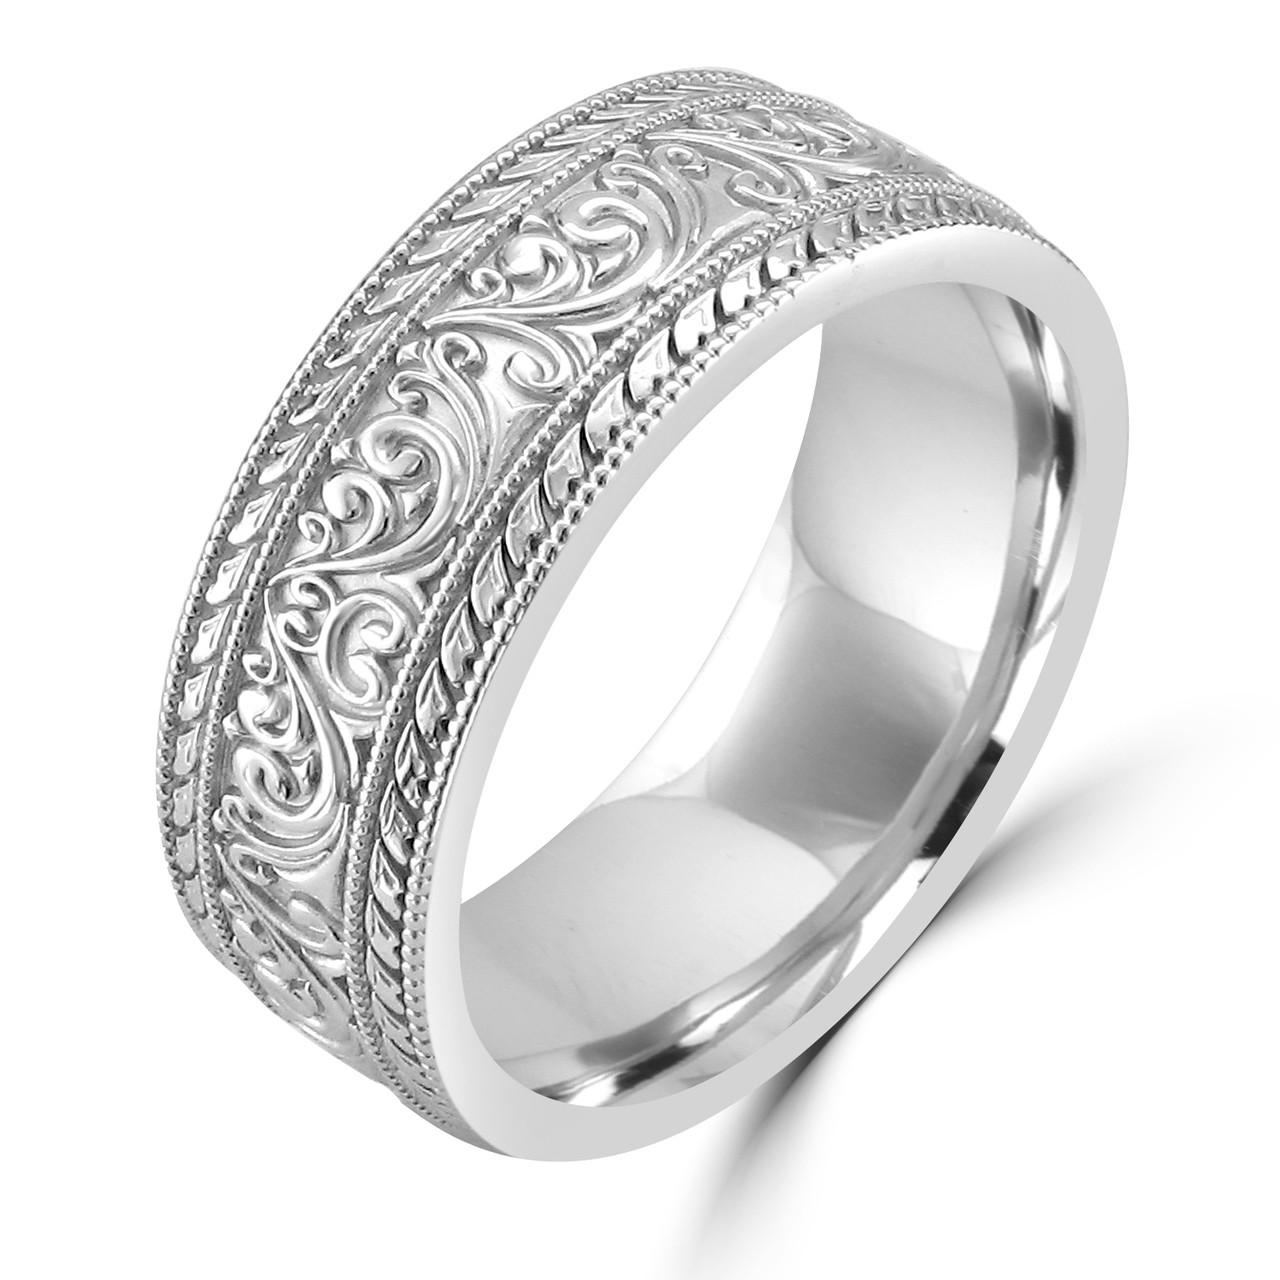 14K White Gold Unique Art Nouveau Carved Wedding Band - Wedding Bands & Co.